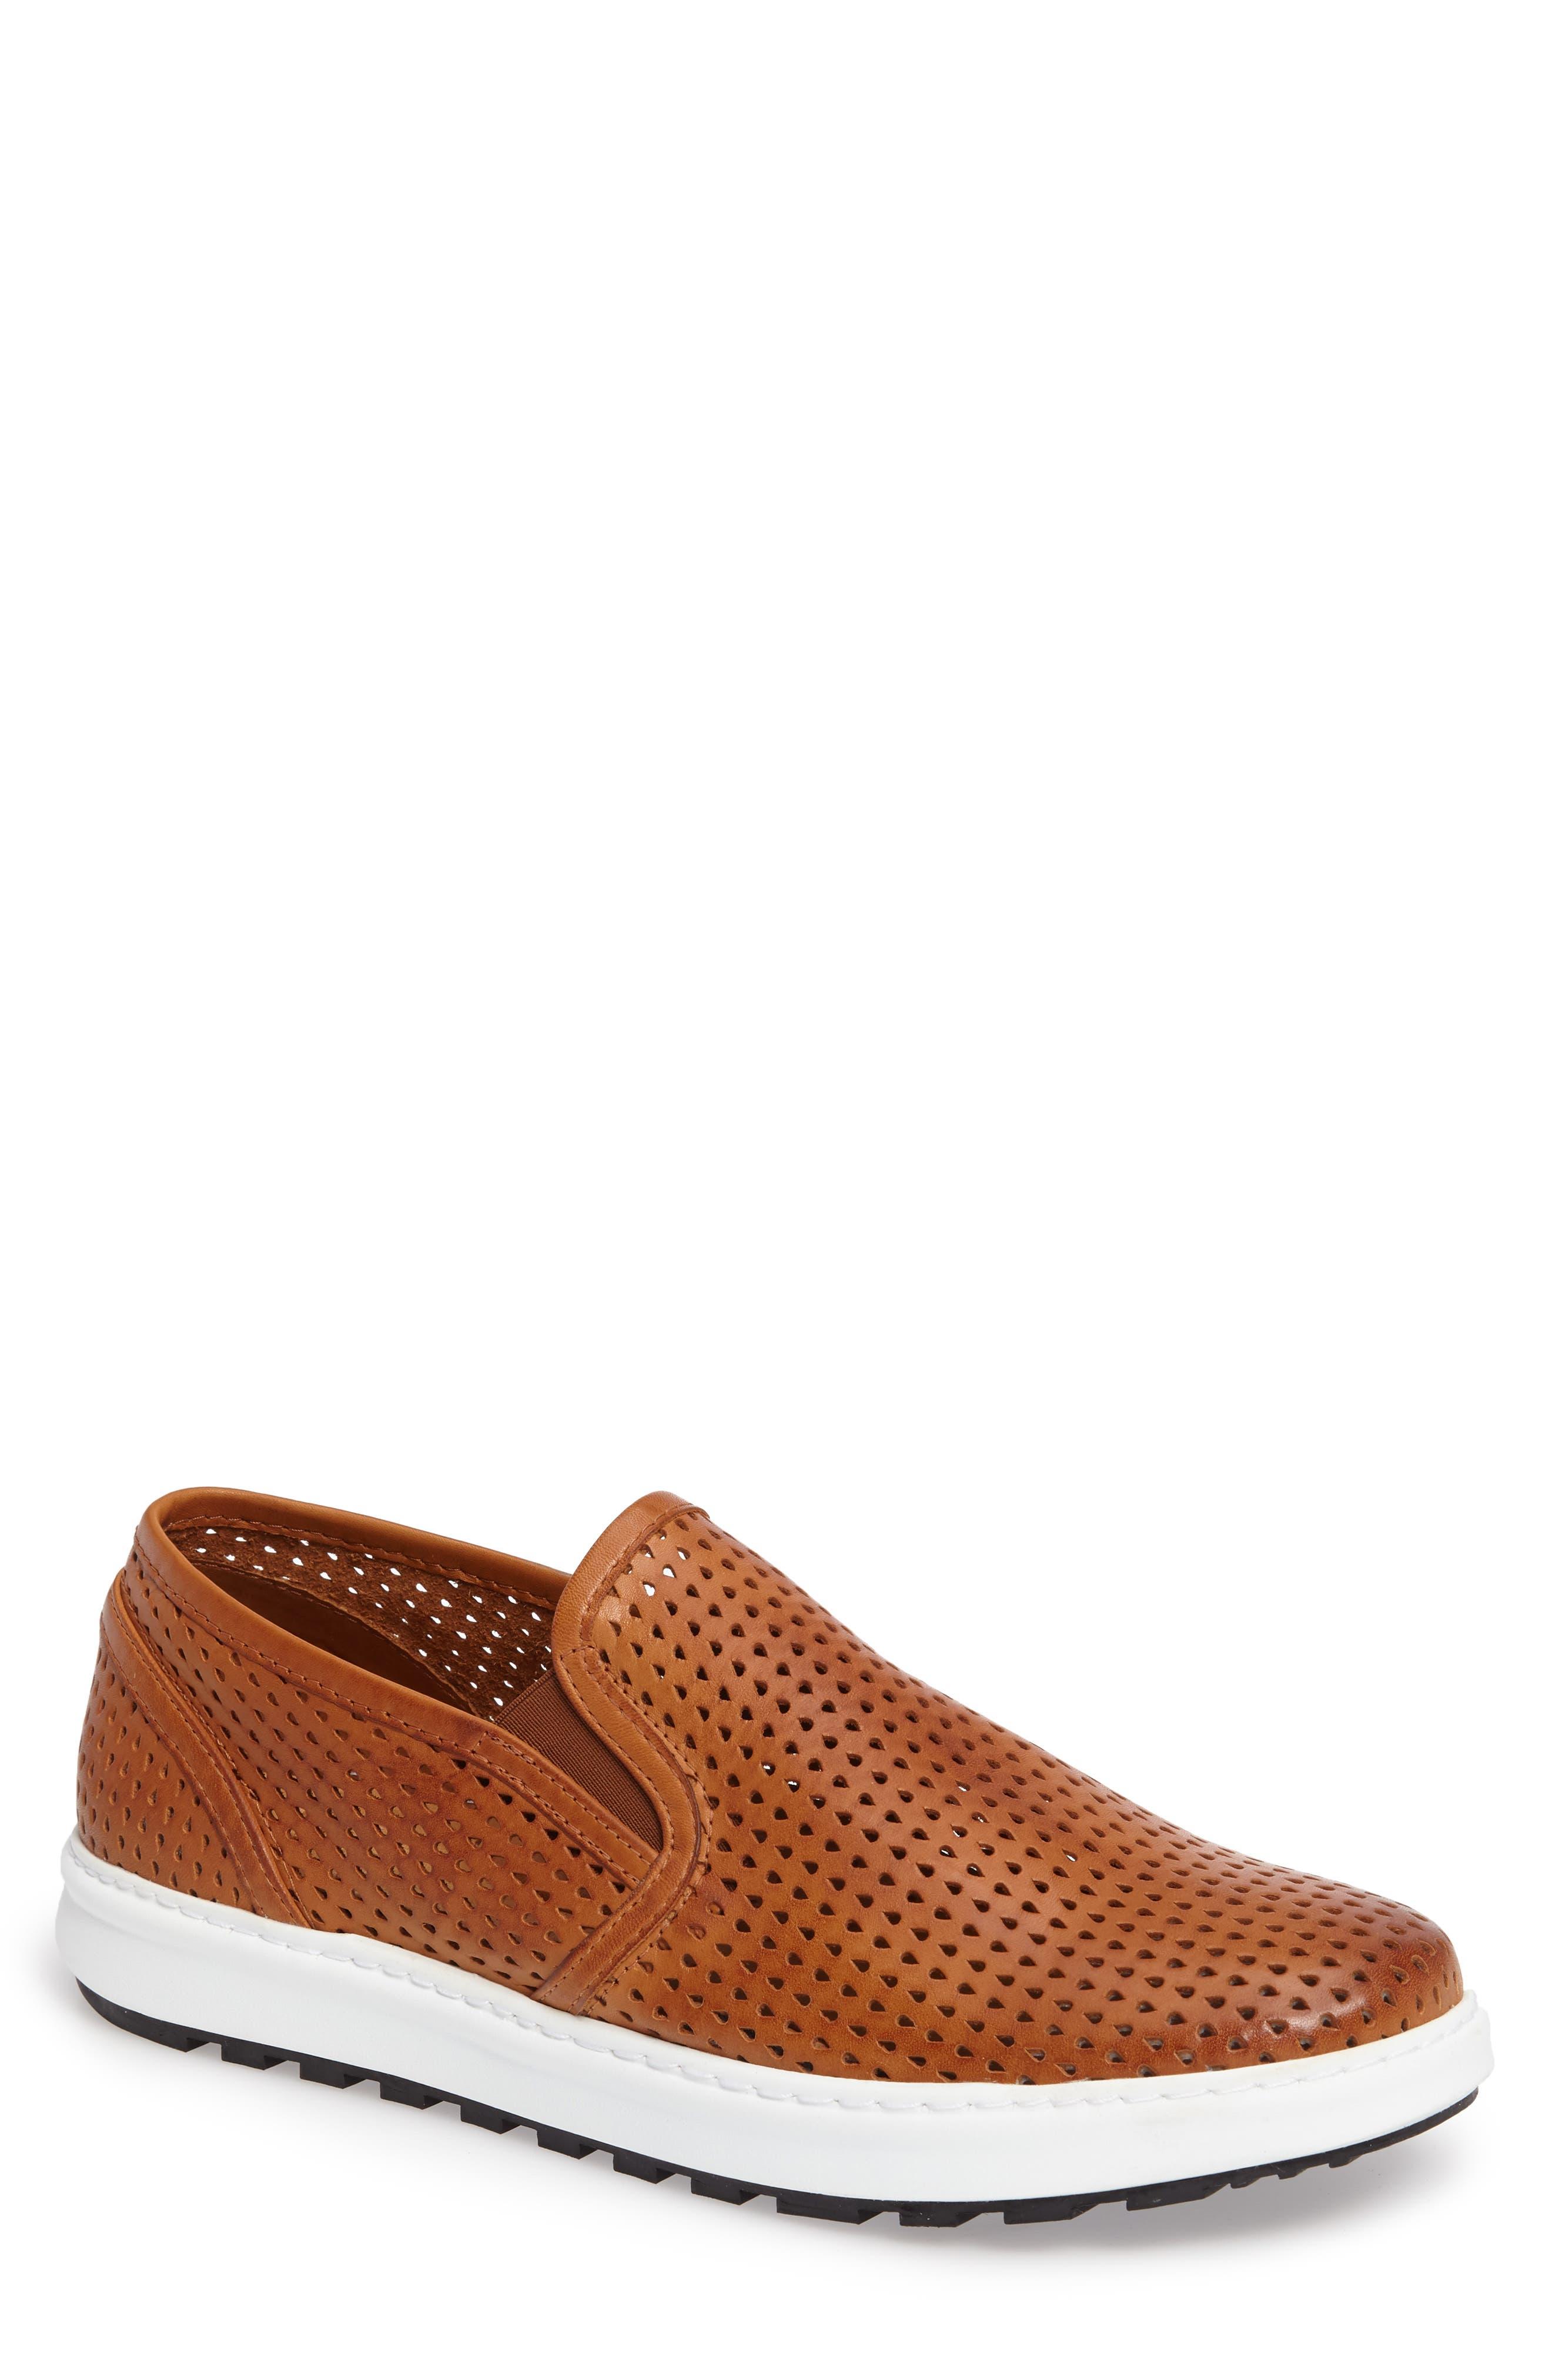 Sebasten Slip-On,                         Main,                         color, Cognac Leather